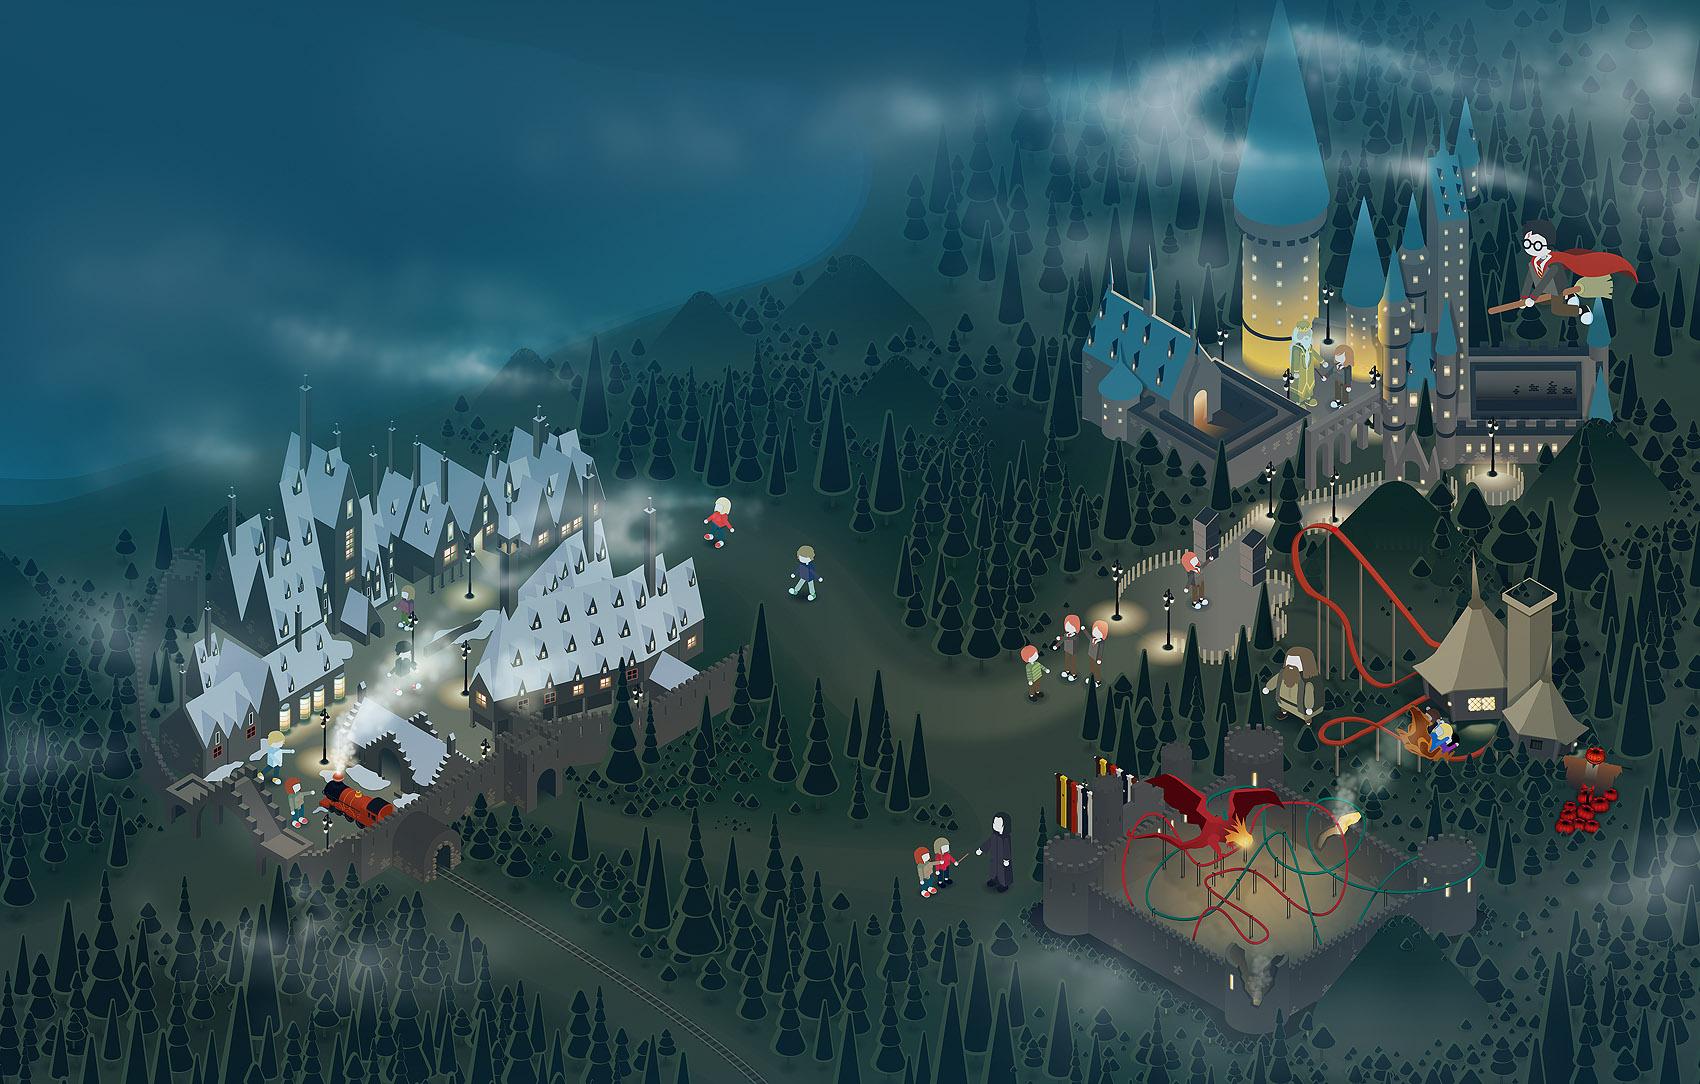 Universal Harry Potter Park magazine ilustration by dchan